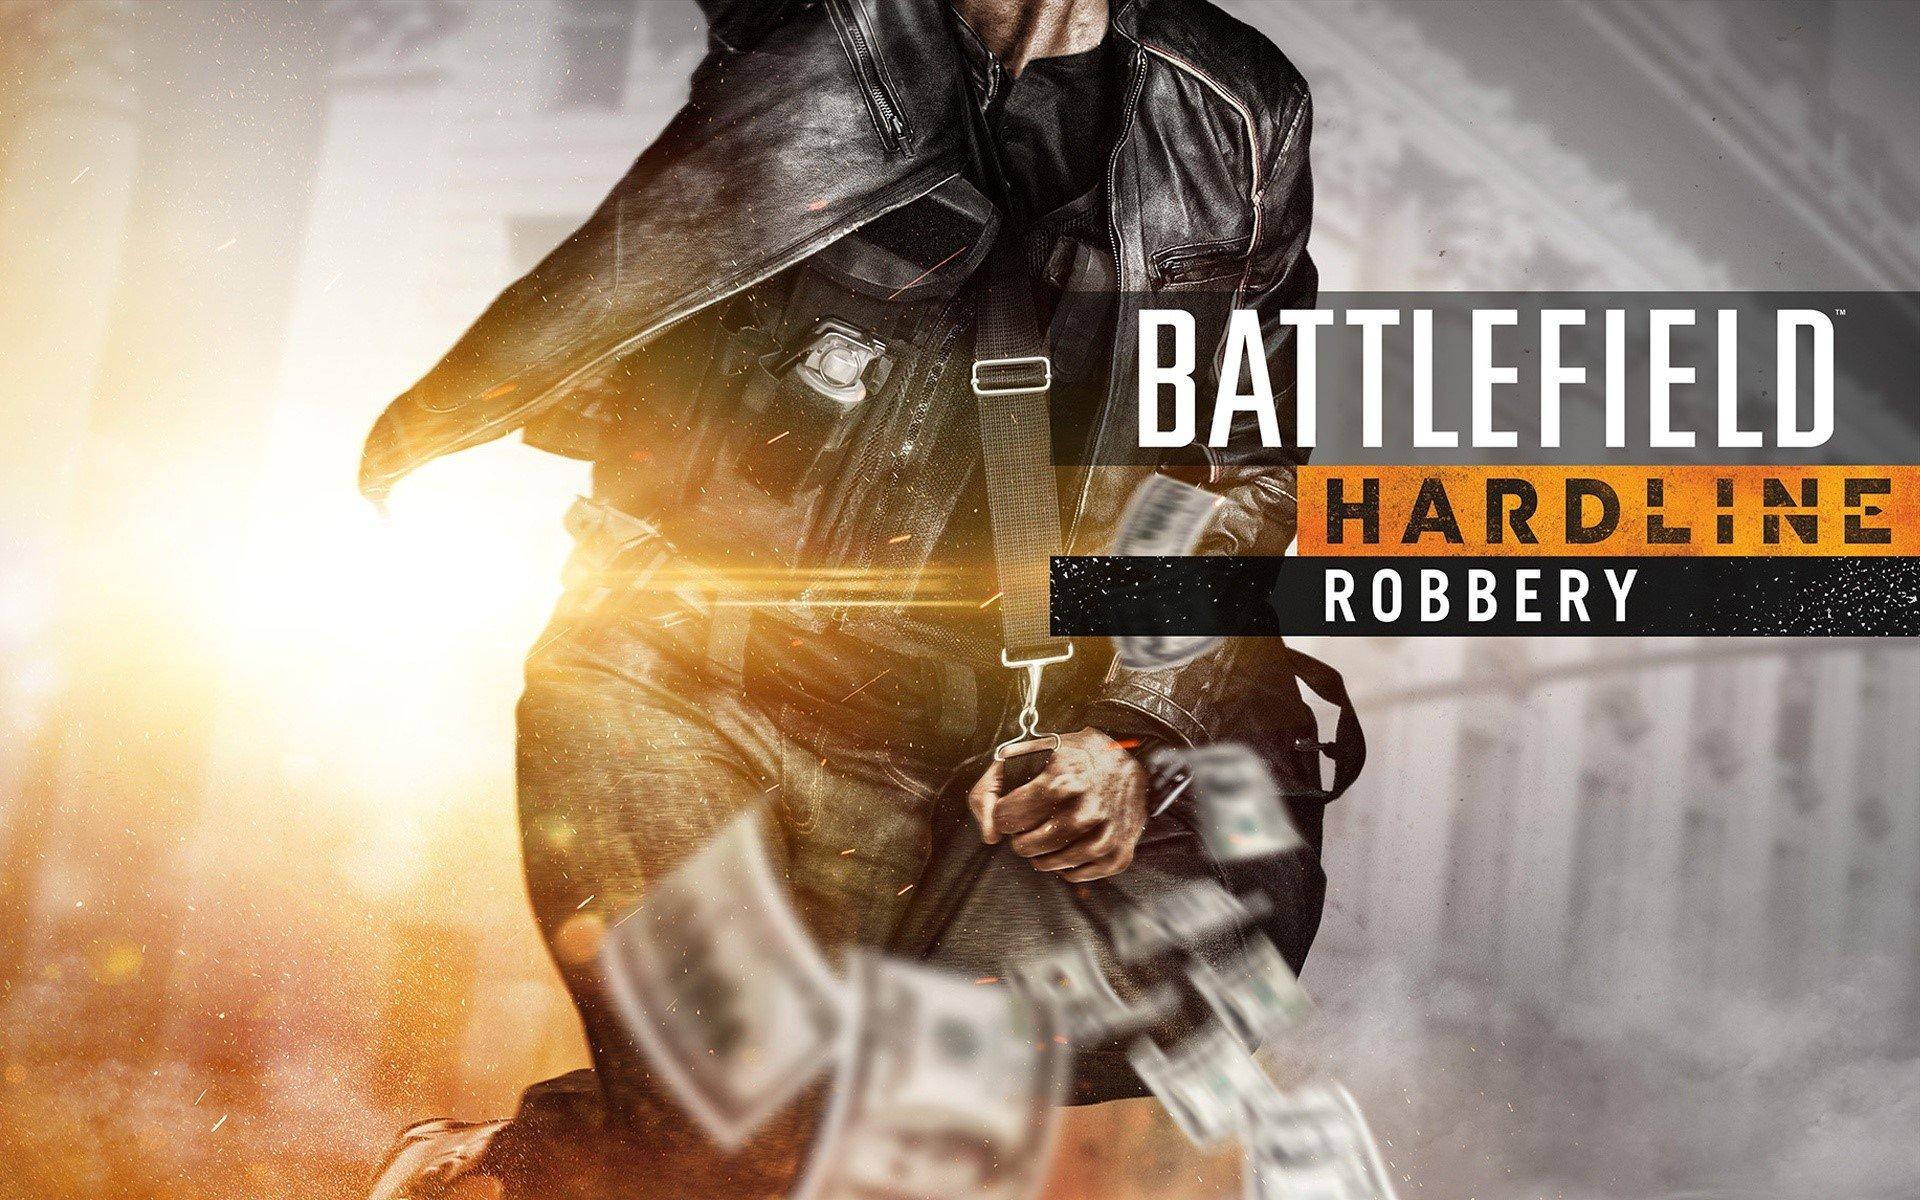 Battlefield Hardline Robbery Fondo De Pantalla Full Hd Id1719